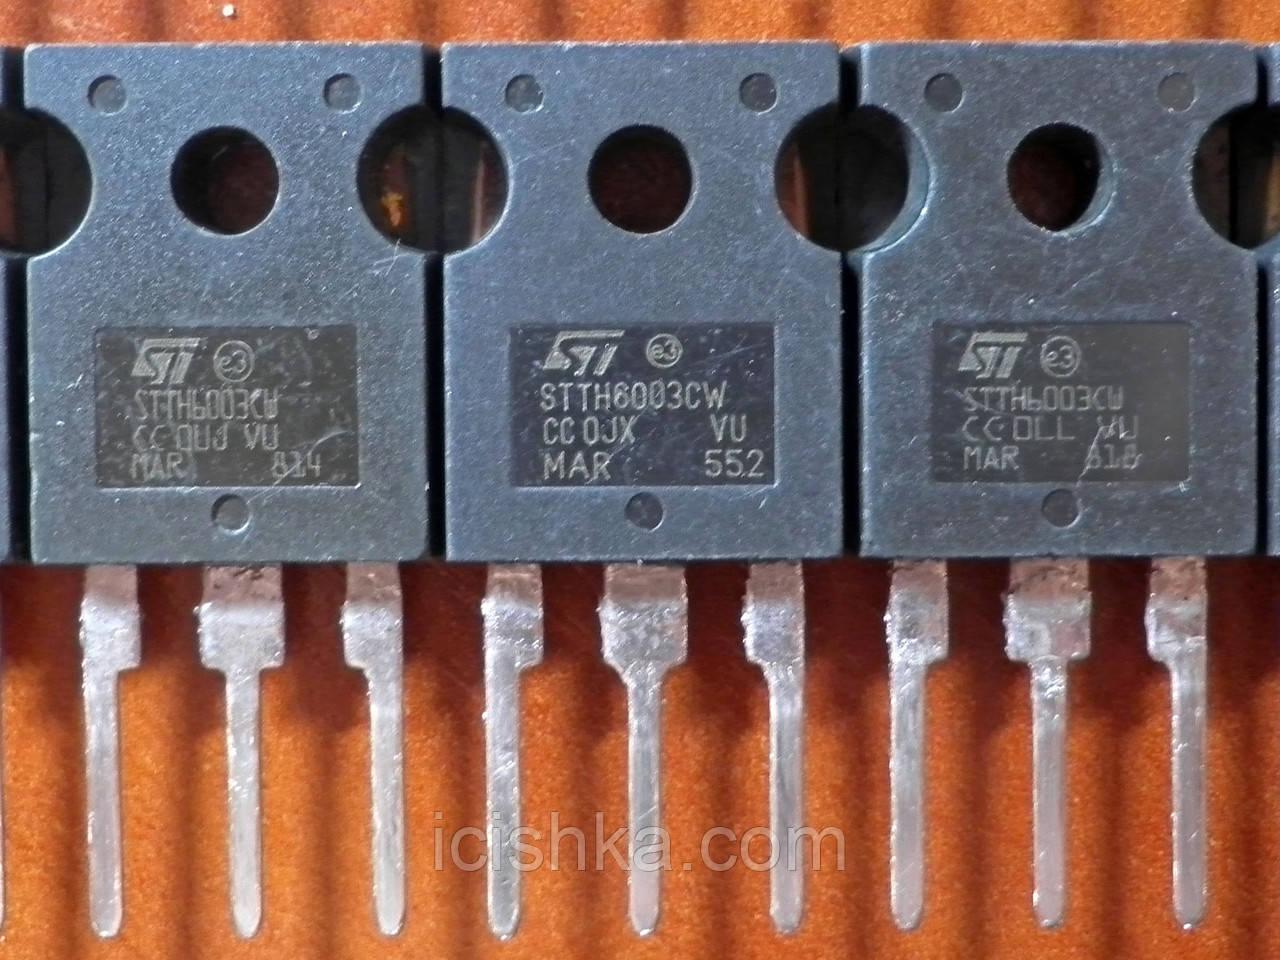 STTH6003CW / STTH6003 TO-247 - ультрабыстрый диод для сварочного инвертора (Refurb)